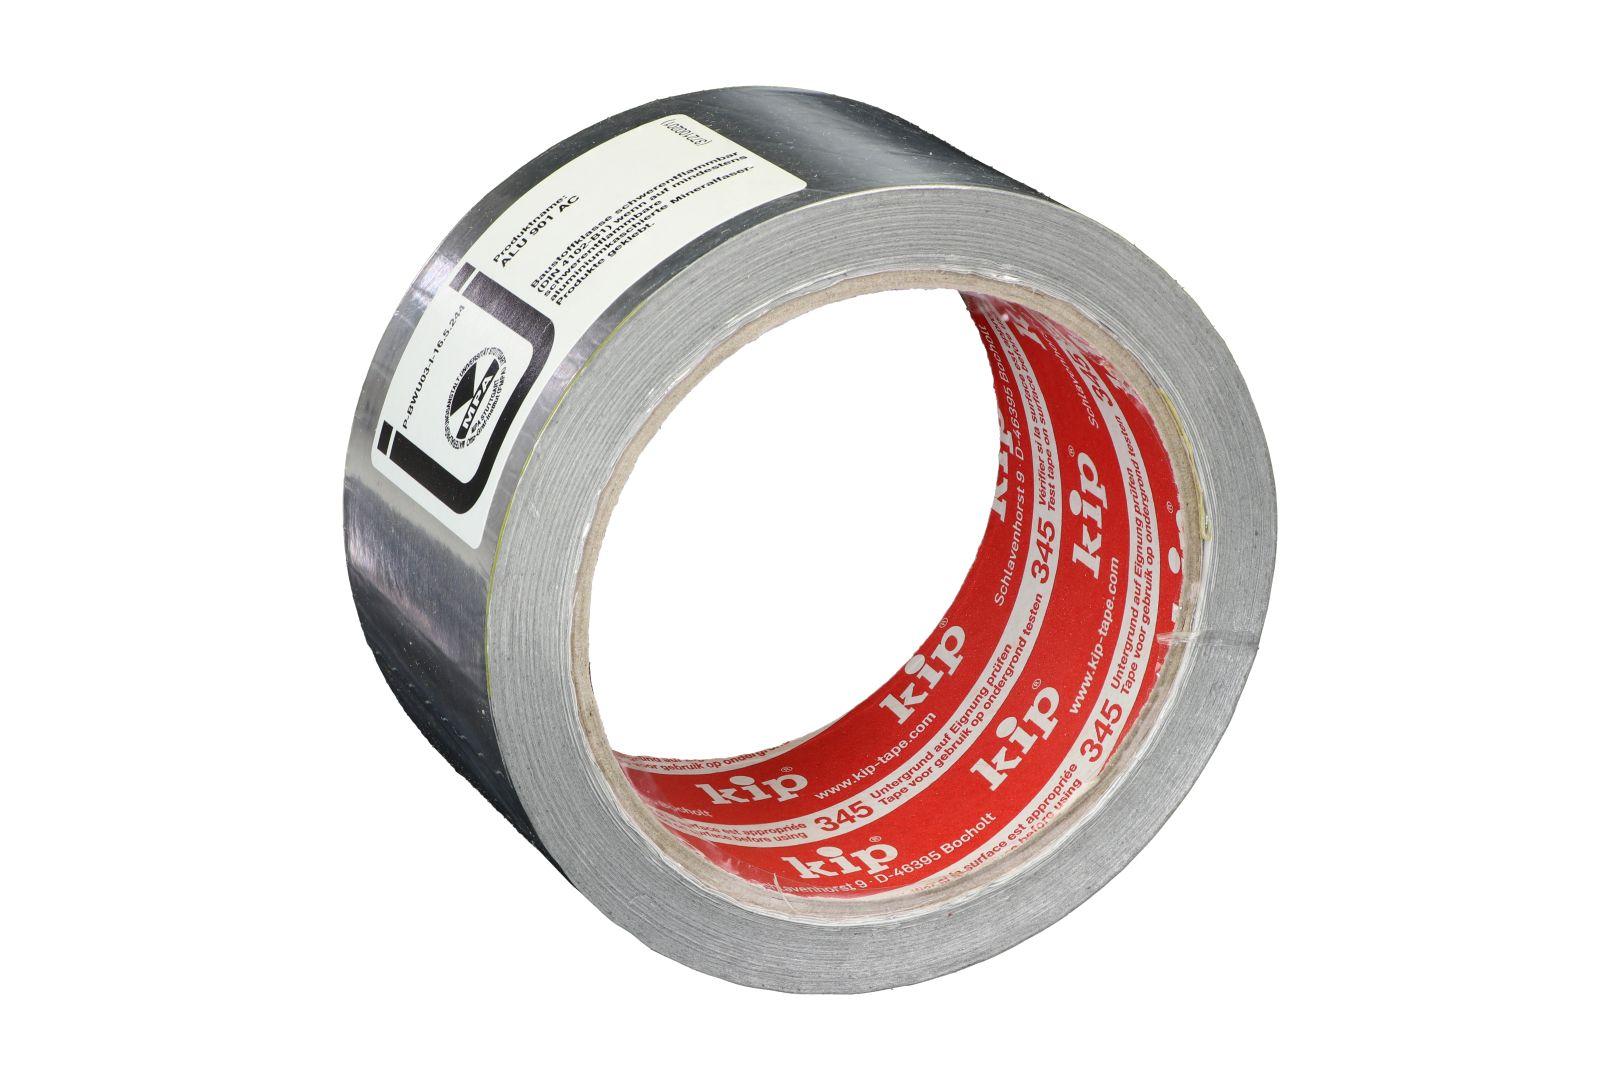 KIP 345-31, Aluminiumklebeband mit Liner, Aluband, 50 mm x 25 m